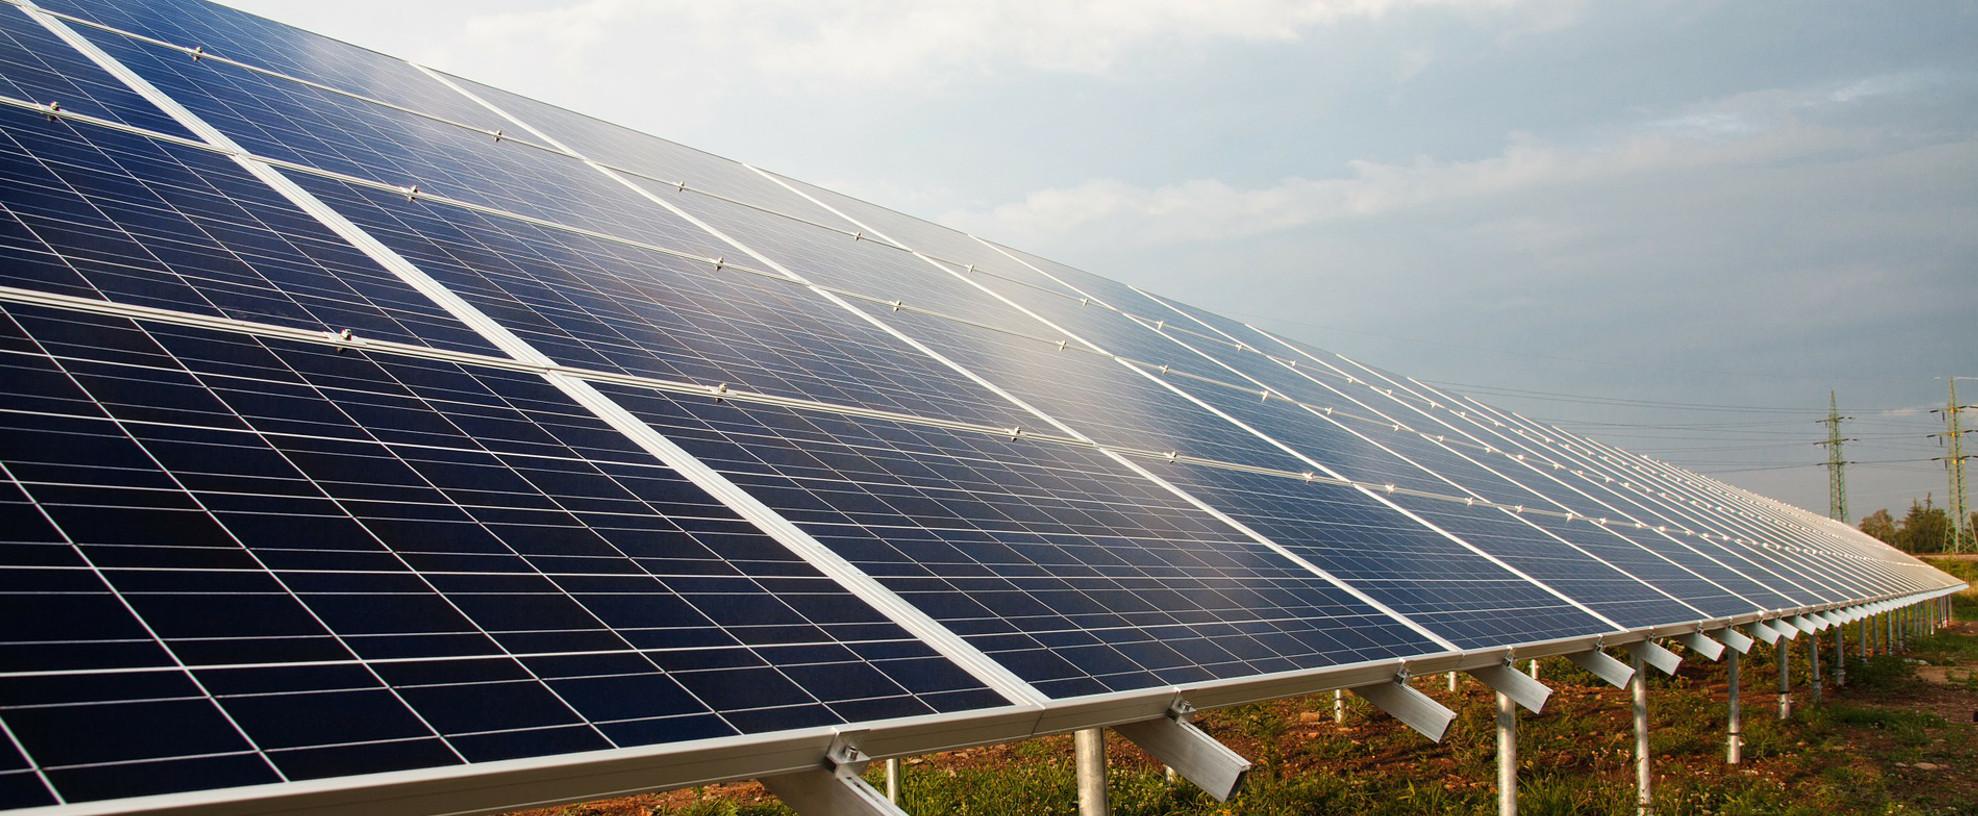 Incentivi pannelli fotovoltaici 2013 44